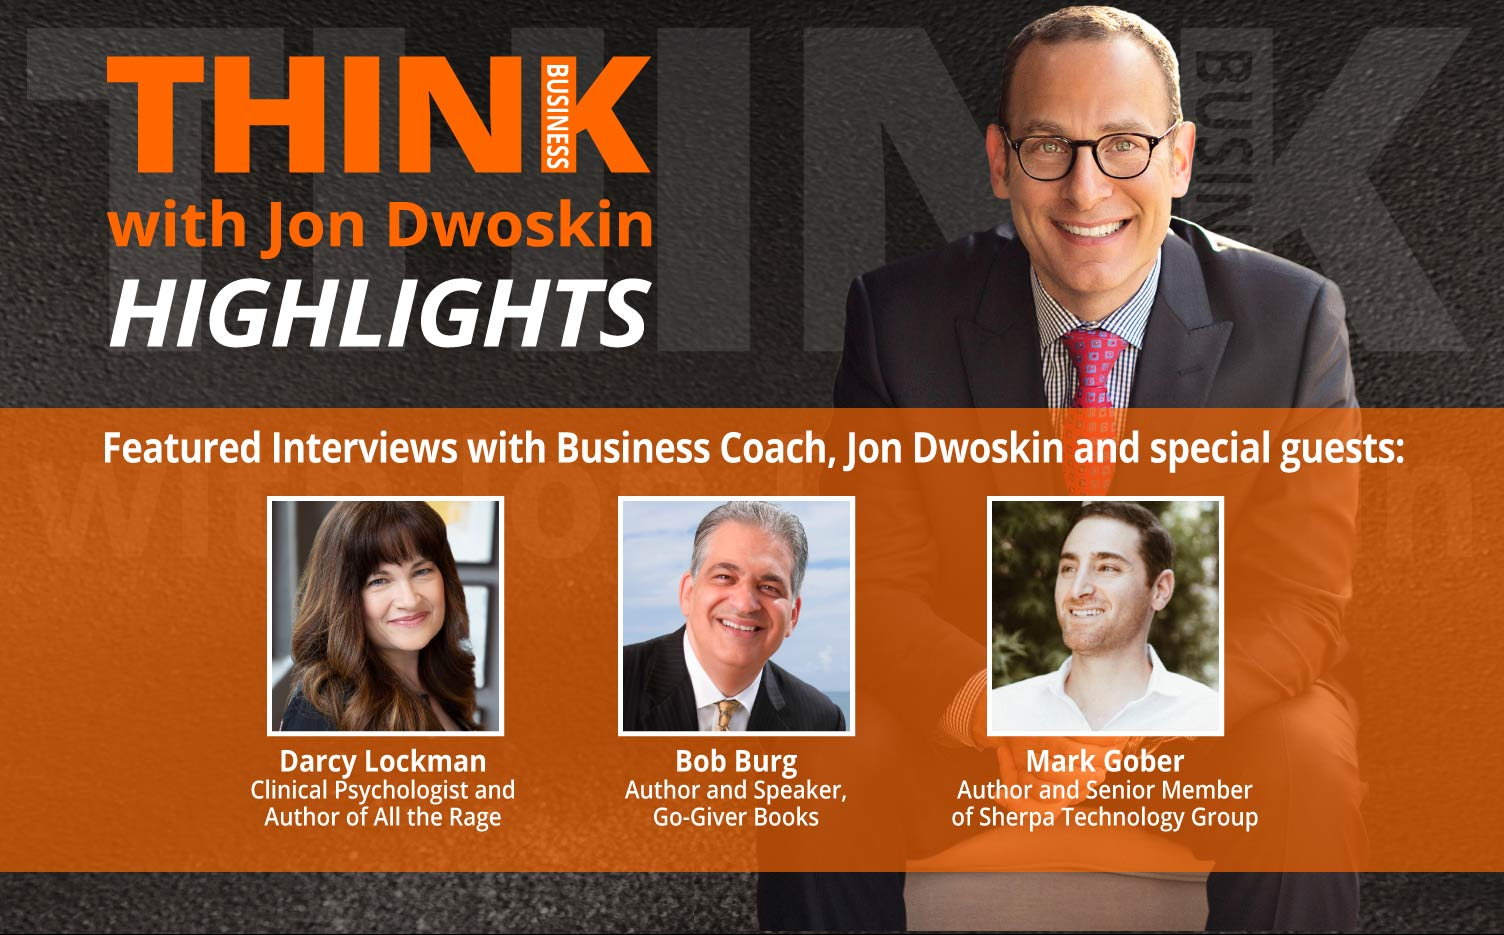 THINK Business: HIGHLIGHTS – Jon Dwoskin Featured Interviews with Darcy Lockman, Bob Burg, Mark Gober